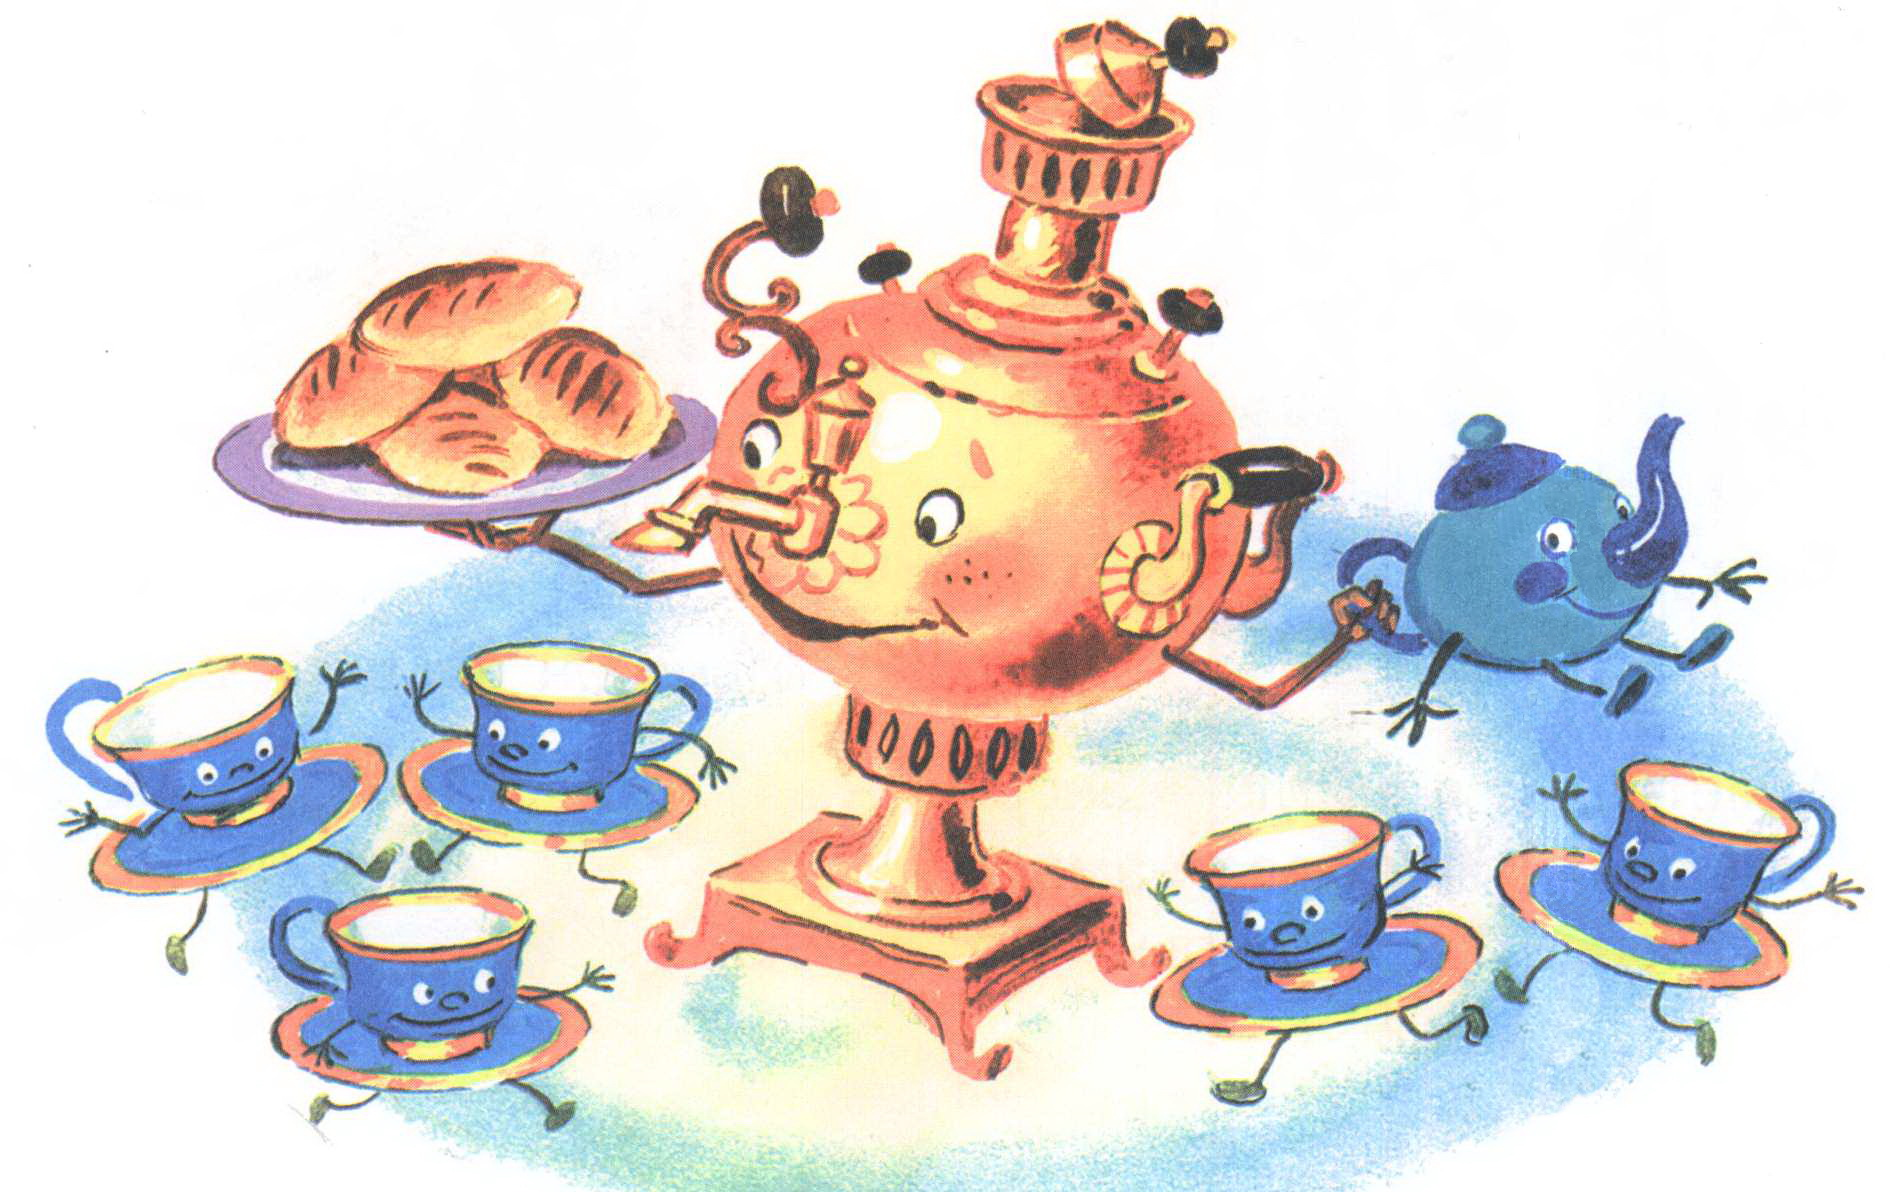 Картинка самовар с чашкой